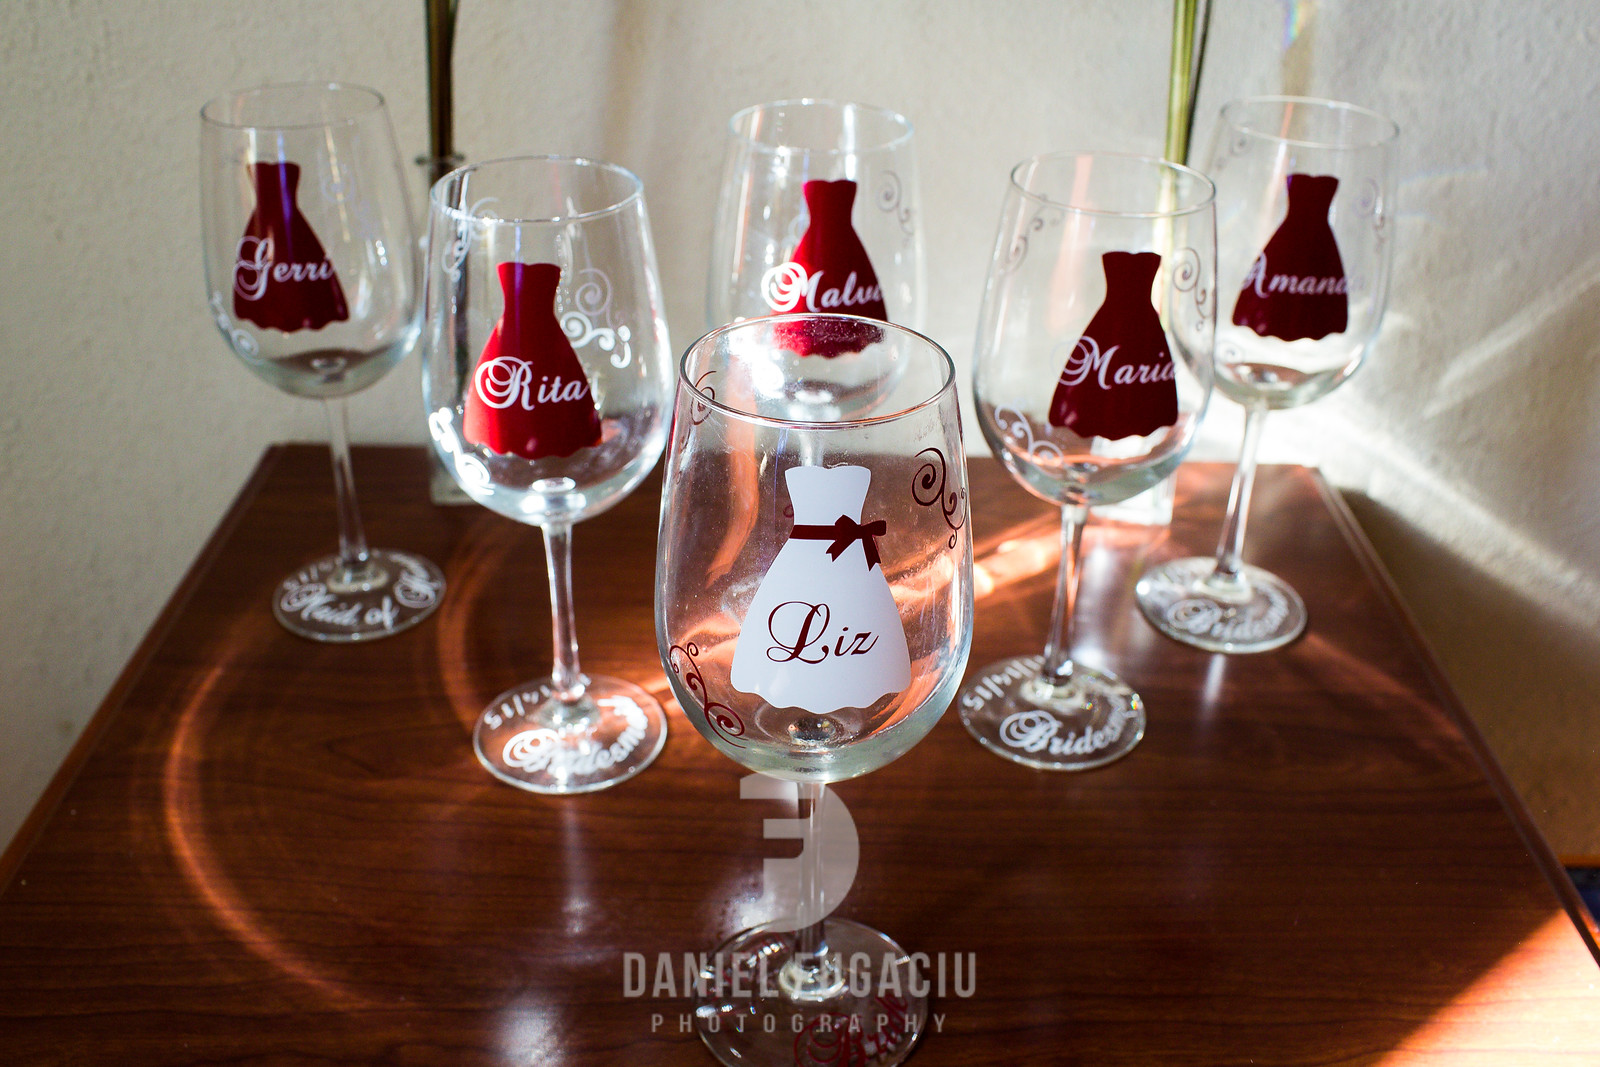 Daniel_Fugaciu_Photography_Liz_Rob_Real_Weddding_April_Lynn_Designs_The_Merion_New_Jersey_Brugundy_Gold_Wedding4